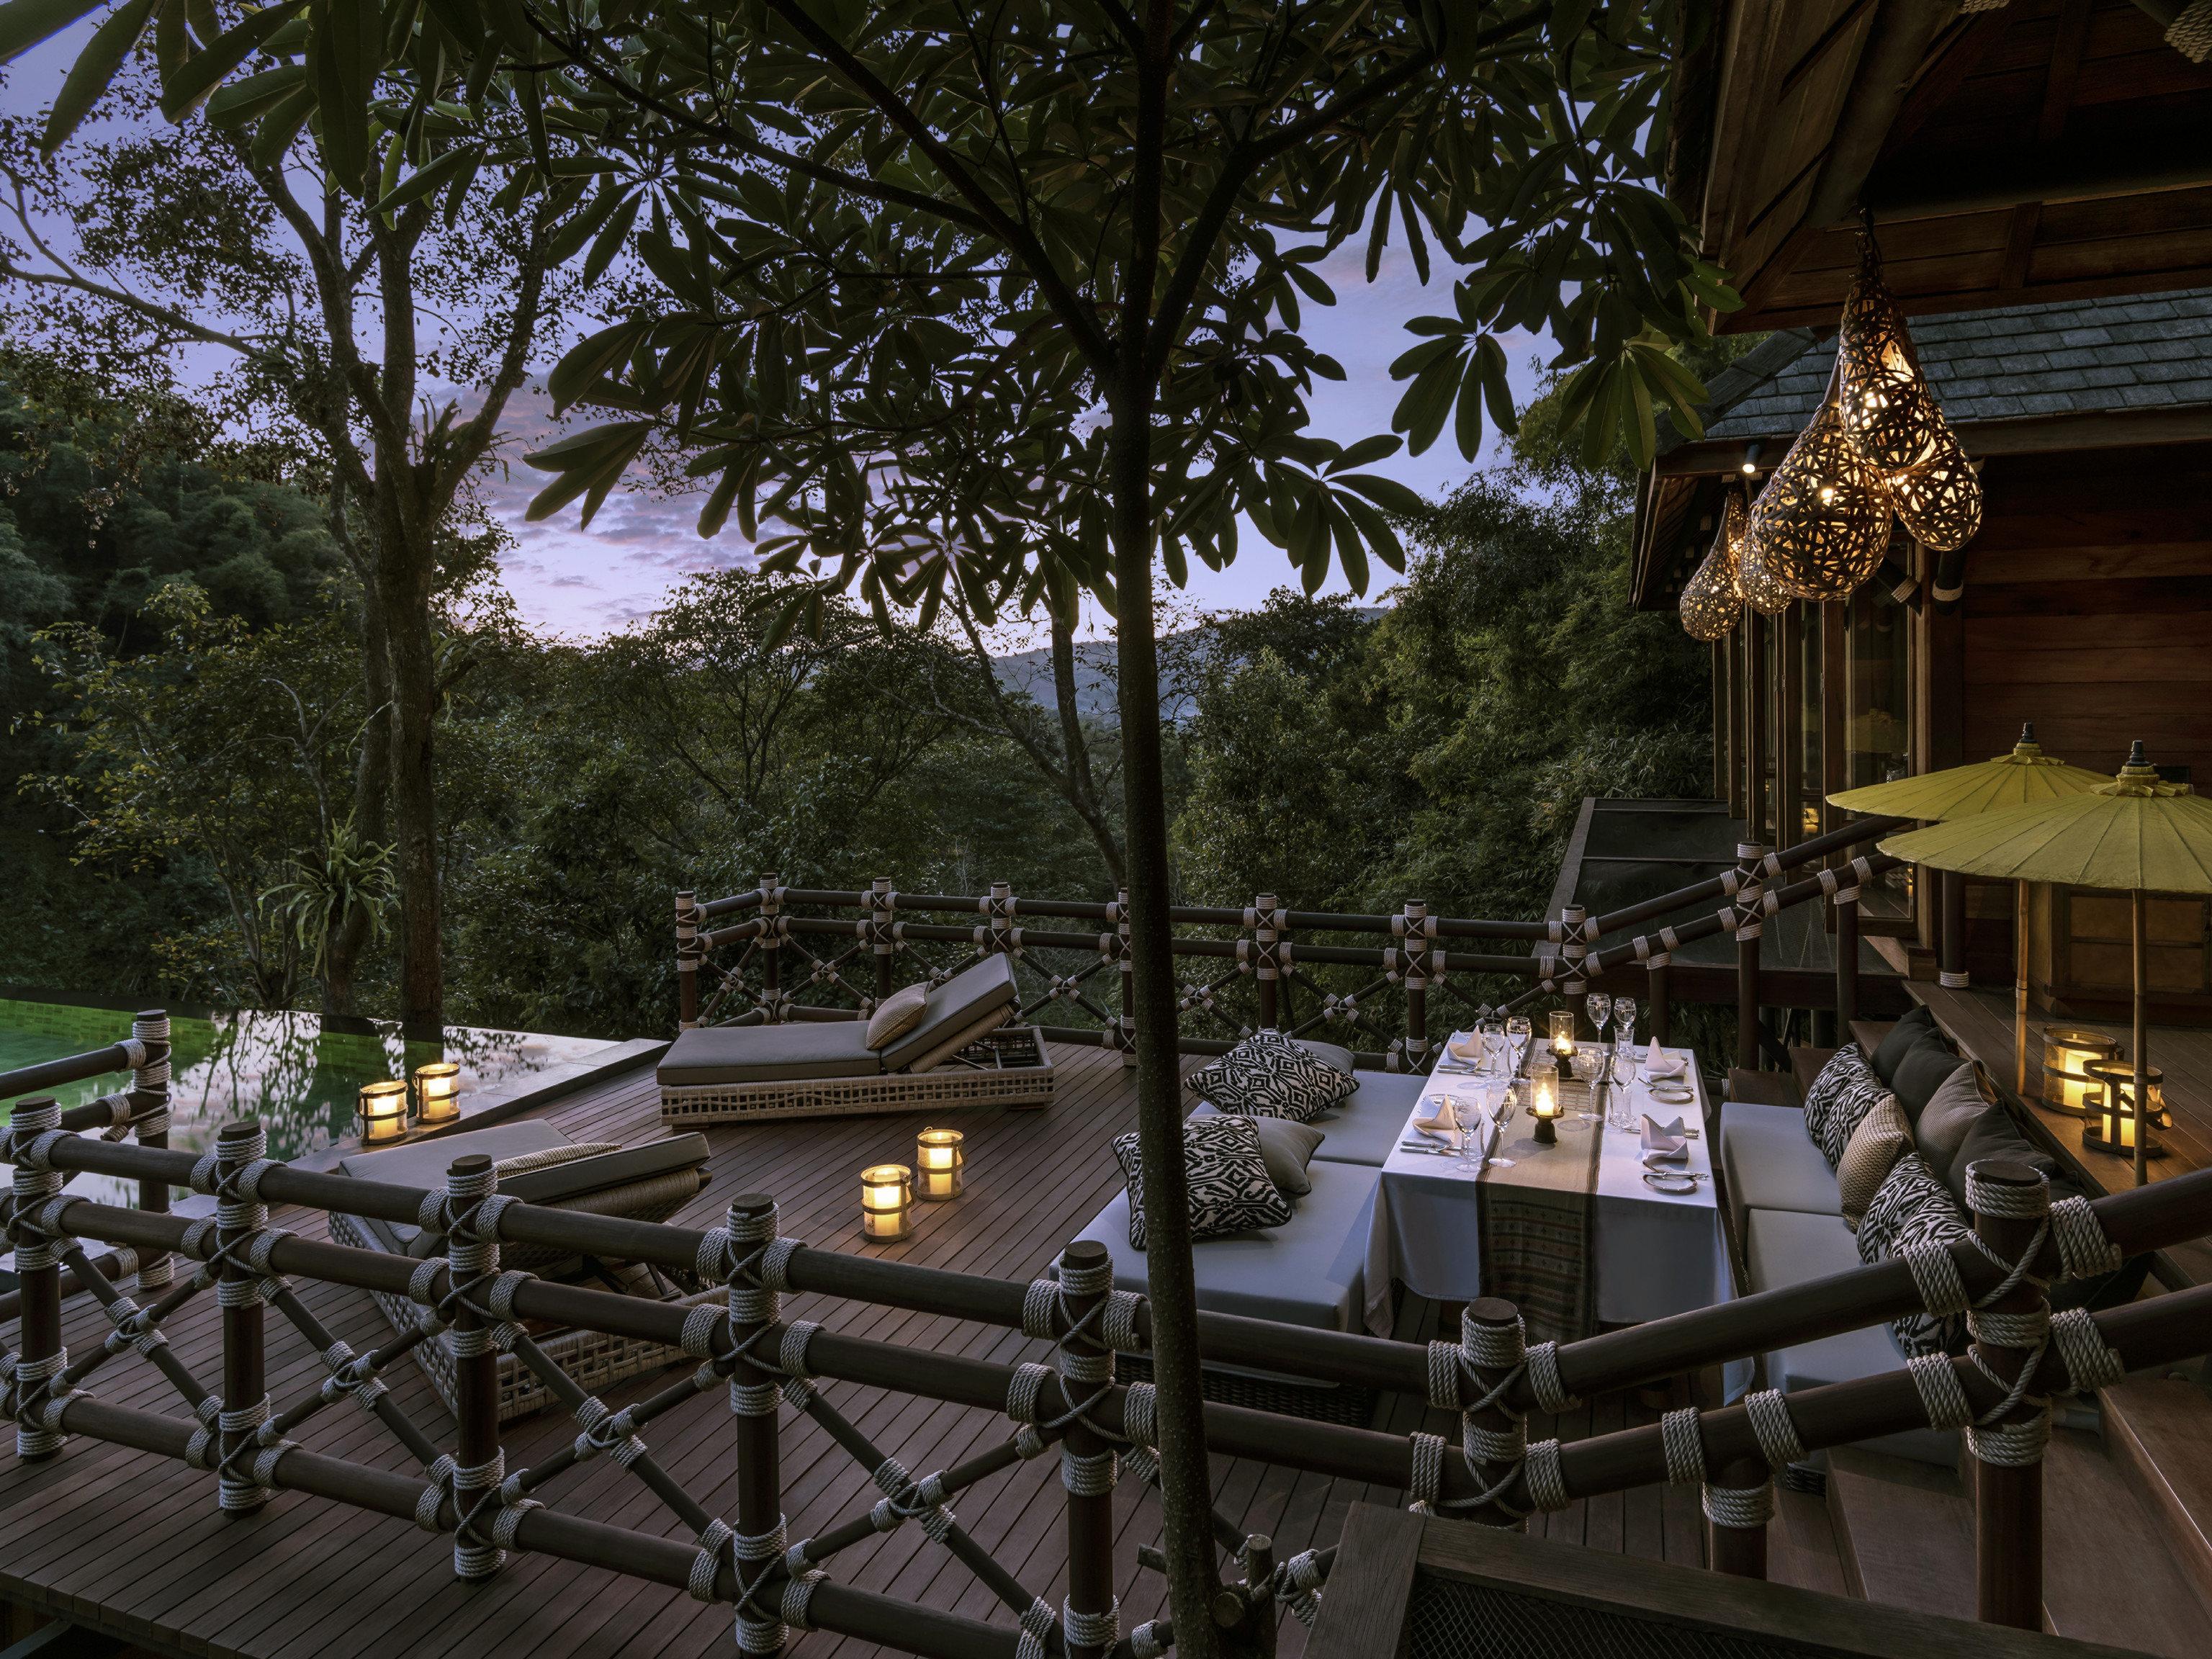 Hotels tree outdoor estate lighting